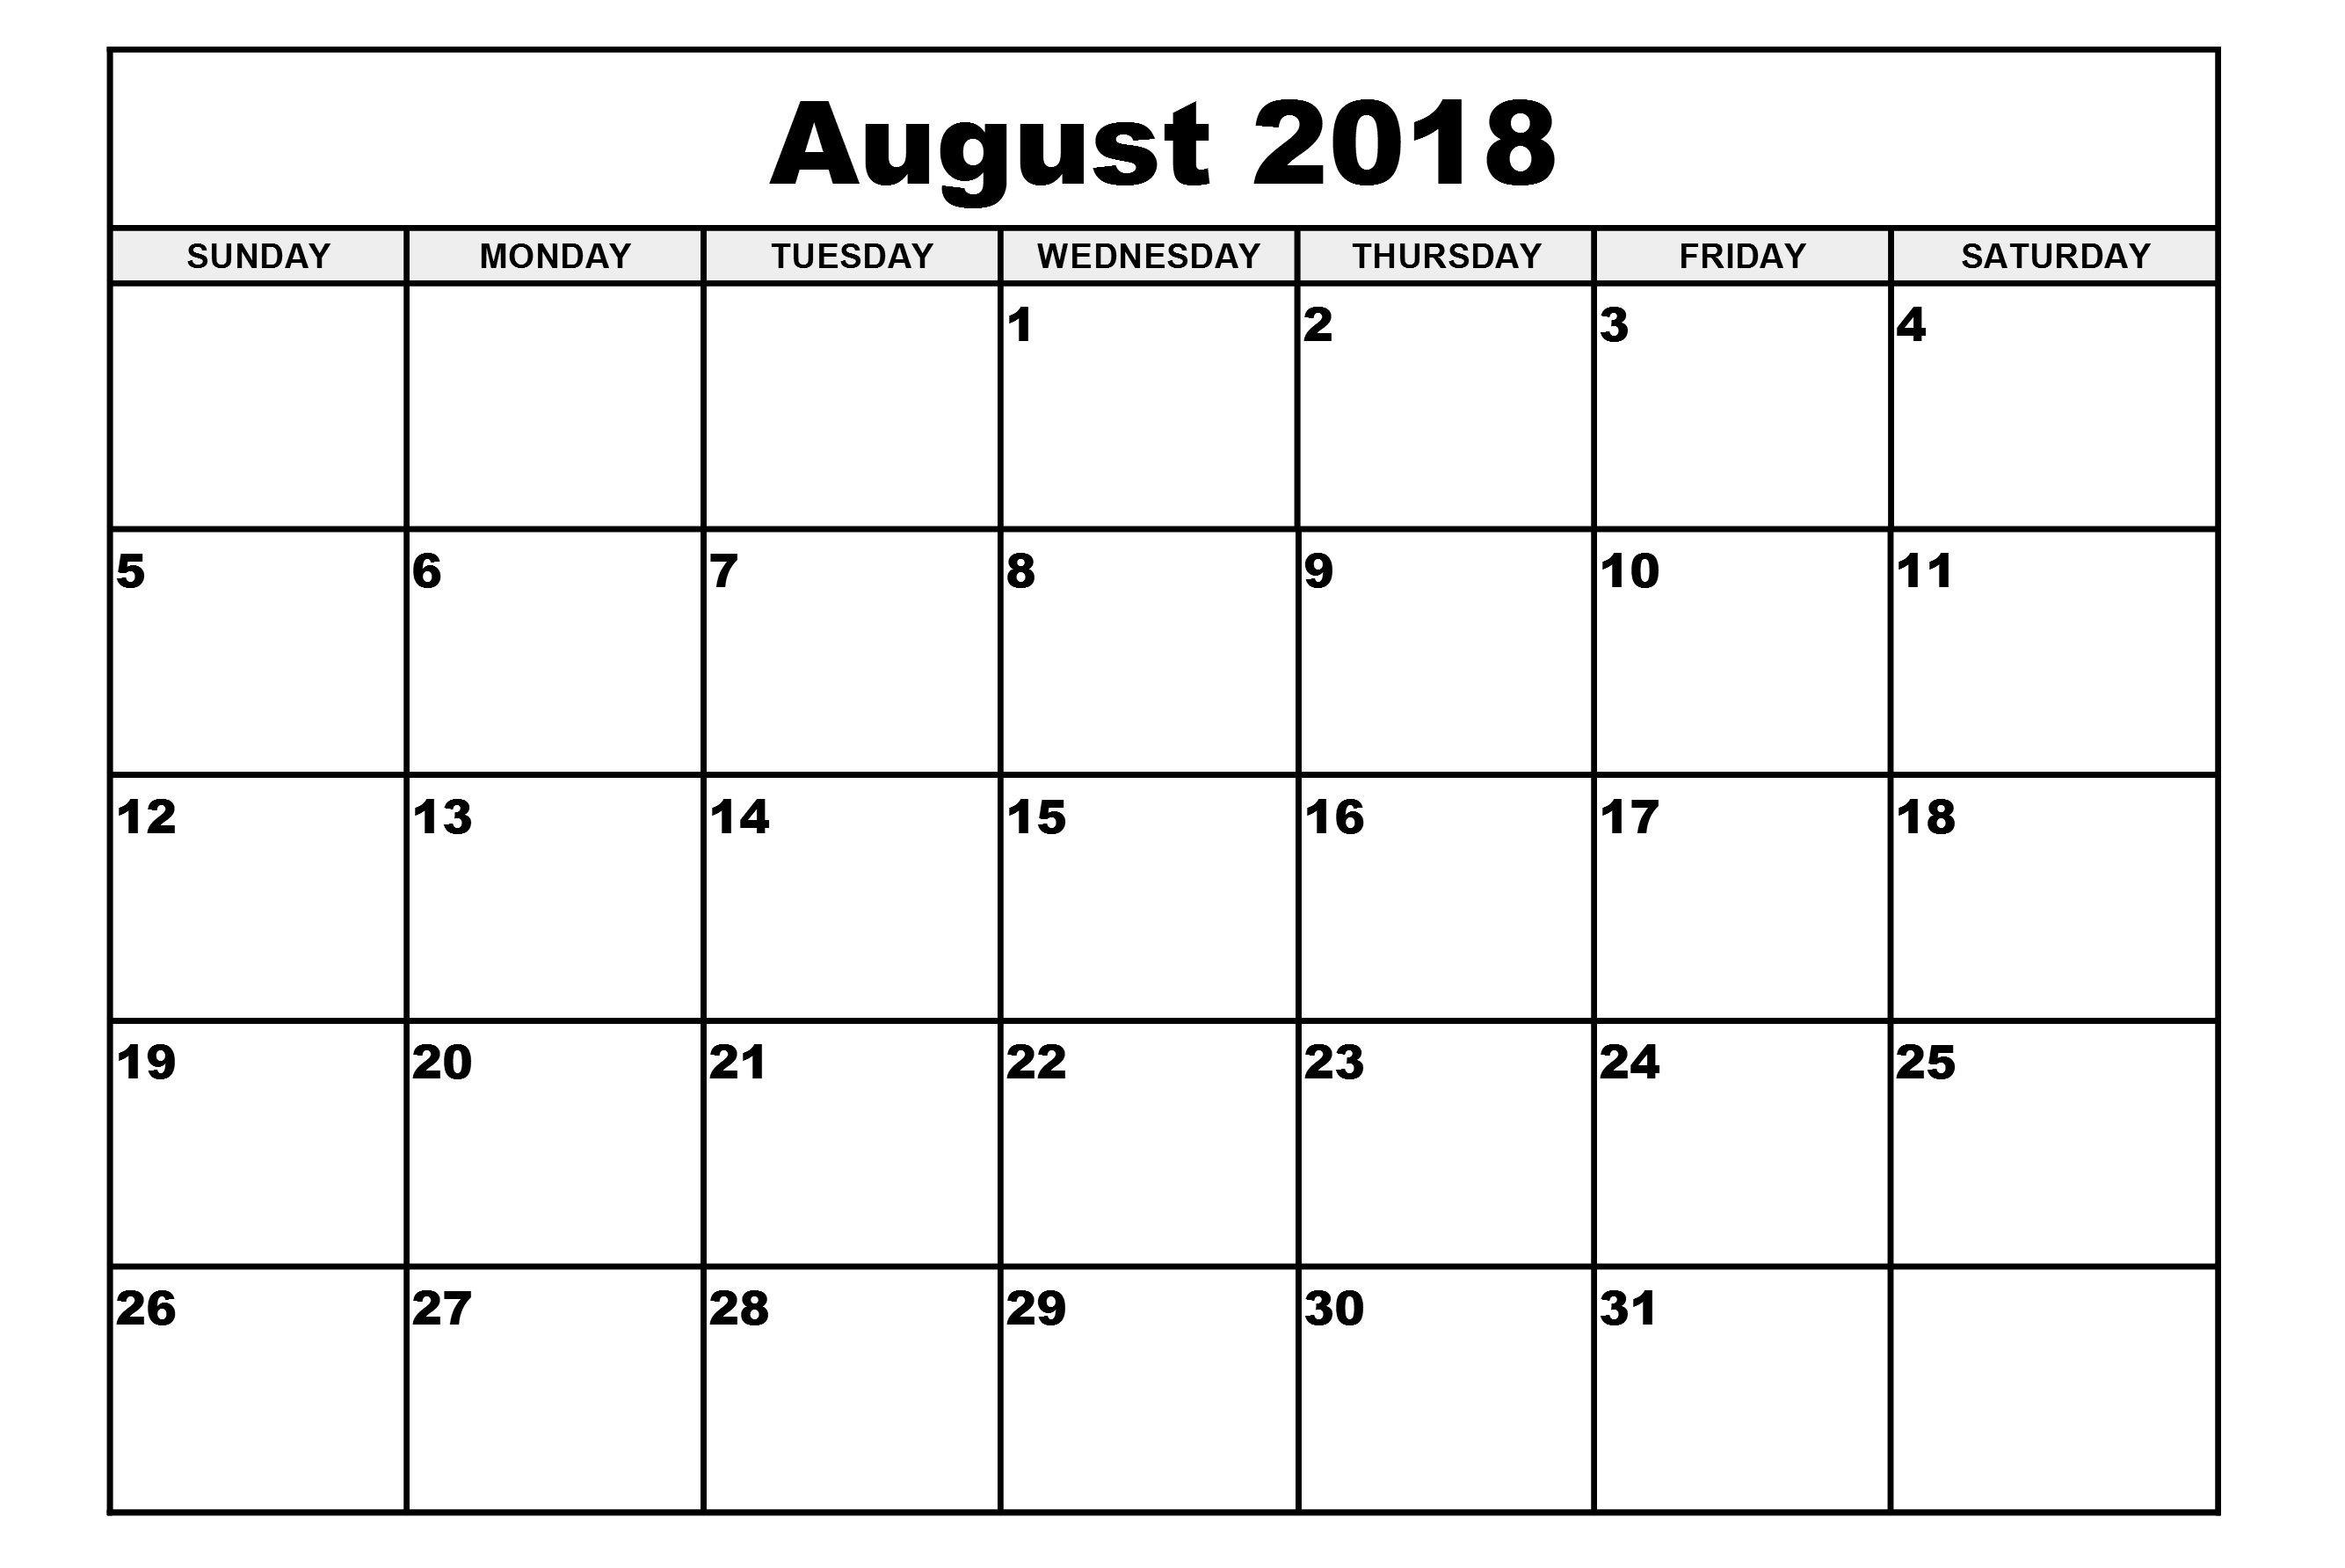 August Calendar 2018 Printable Simple Blank Template August Calendar Free Online Calendar Calendar Template